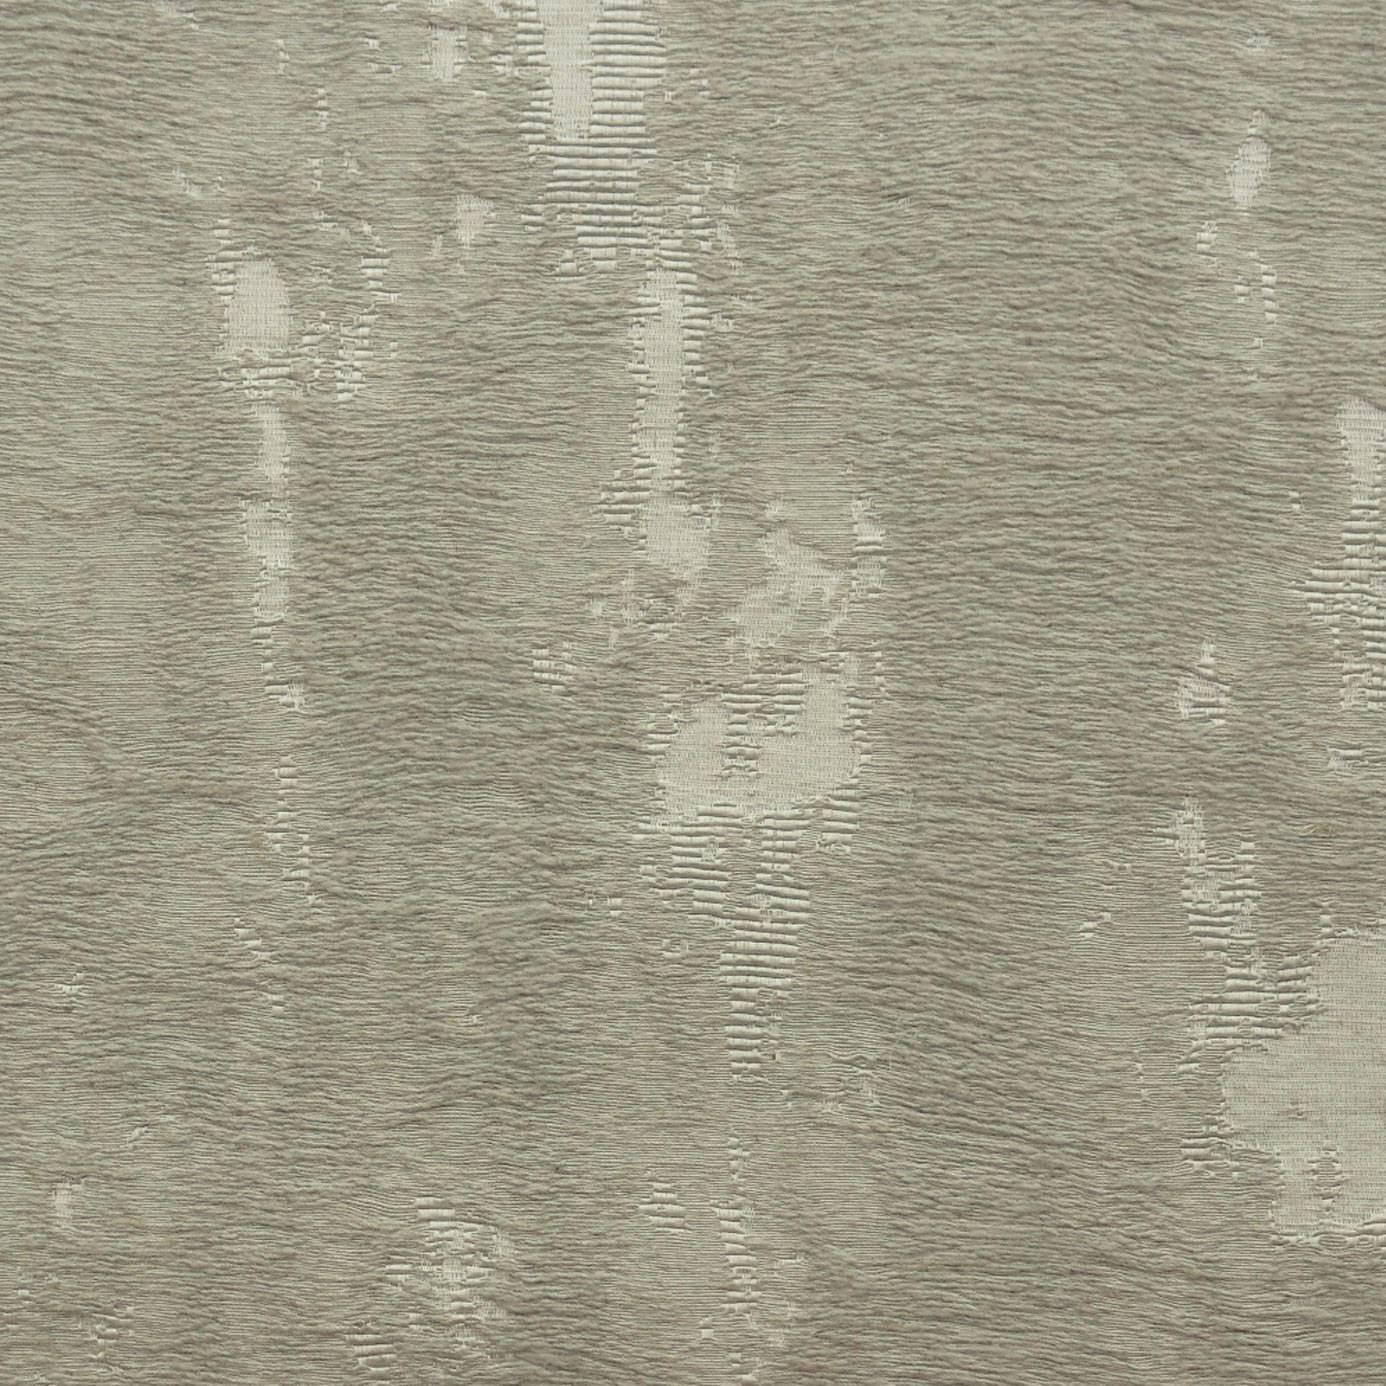 iris fabric gris perle 36810645 casamance villette fabrics collection. Black Bedroom Furniture Sets. Home Design Ideas